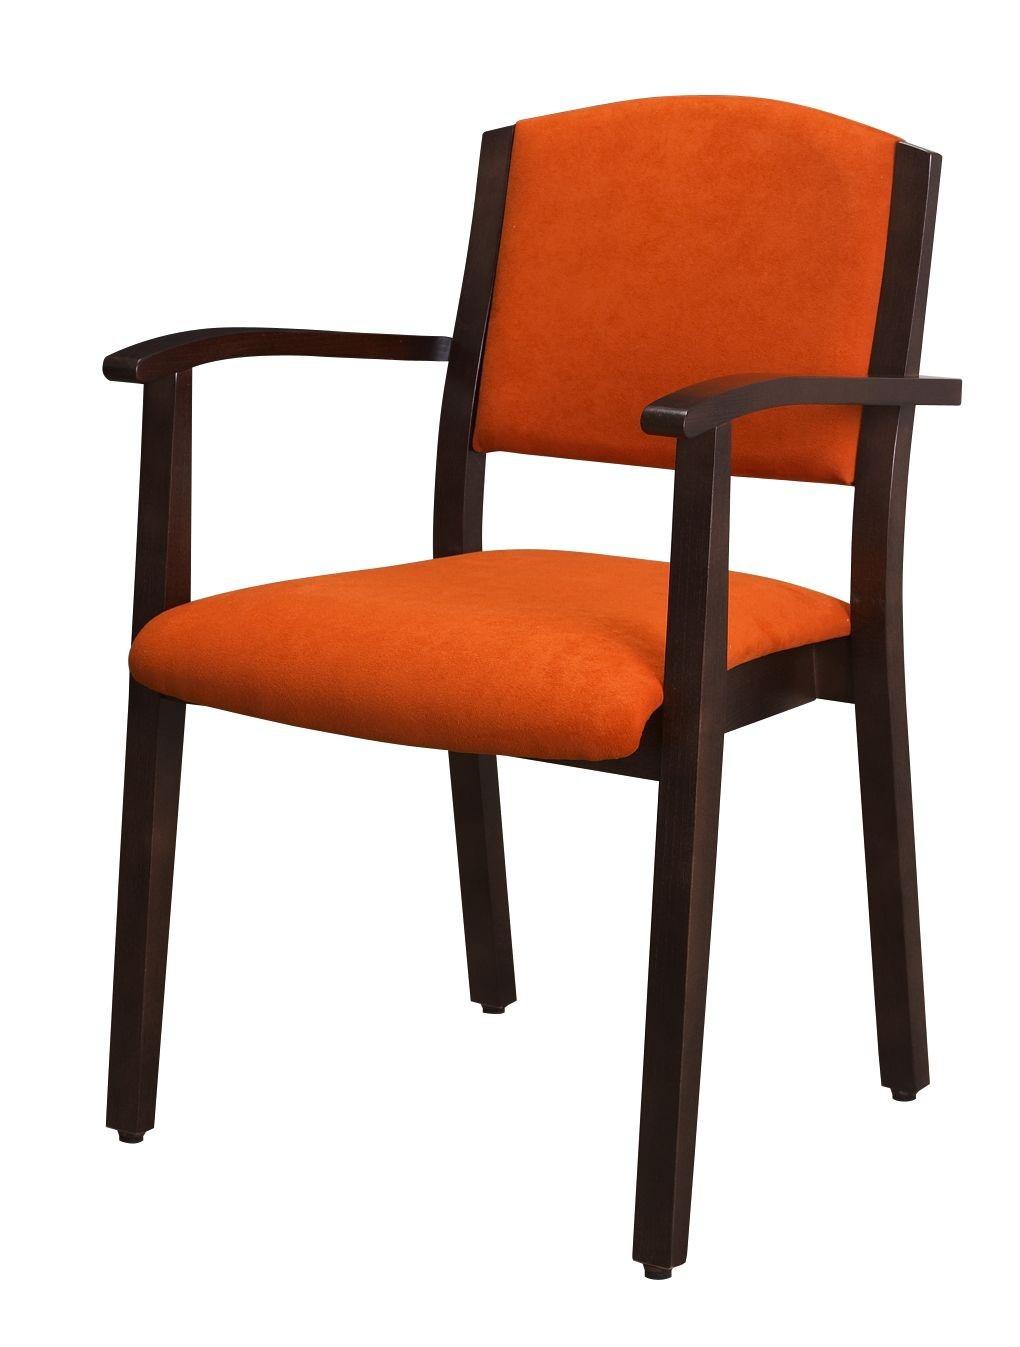 Stuhl olpe - Seniorenstuhl mit armlehne ...